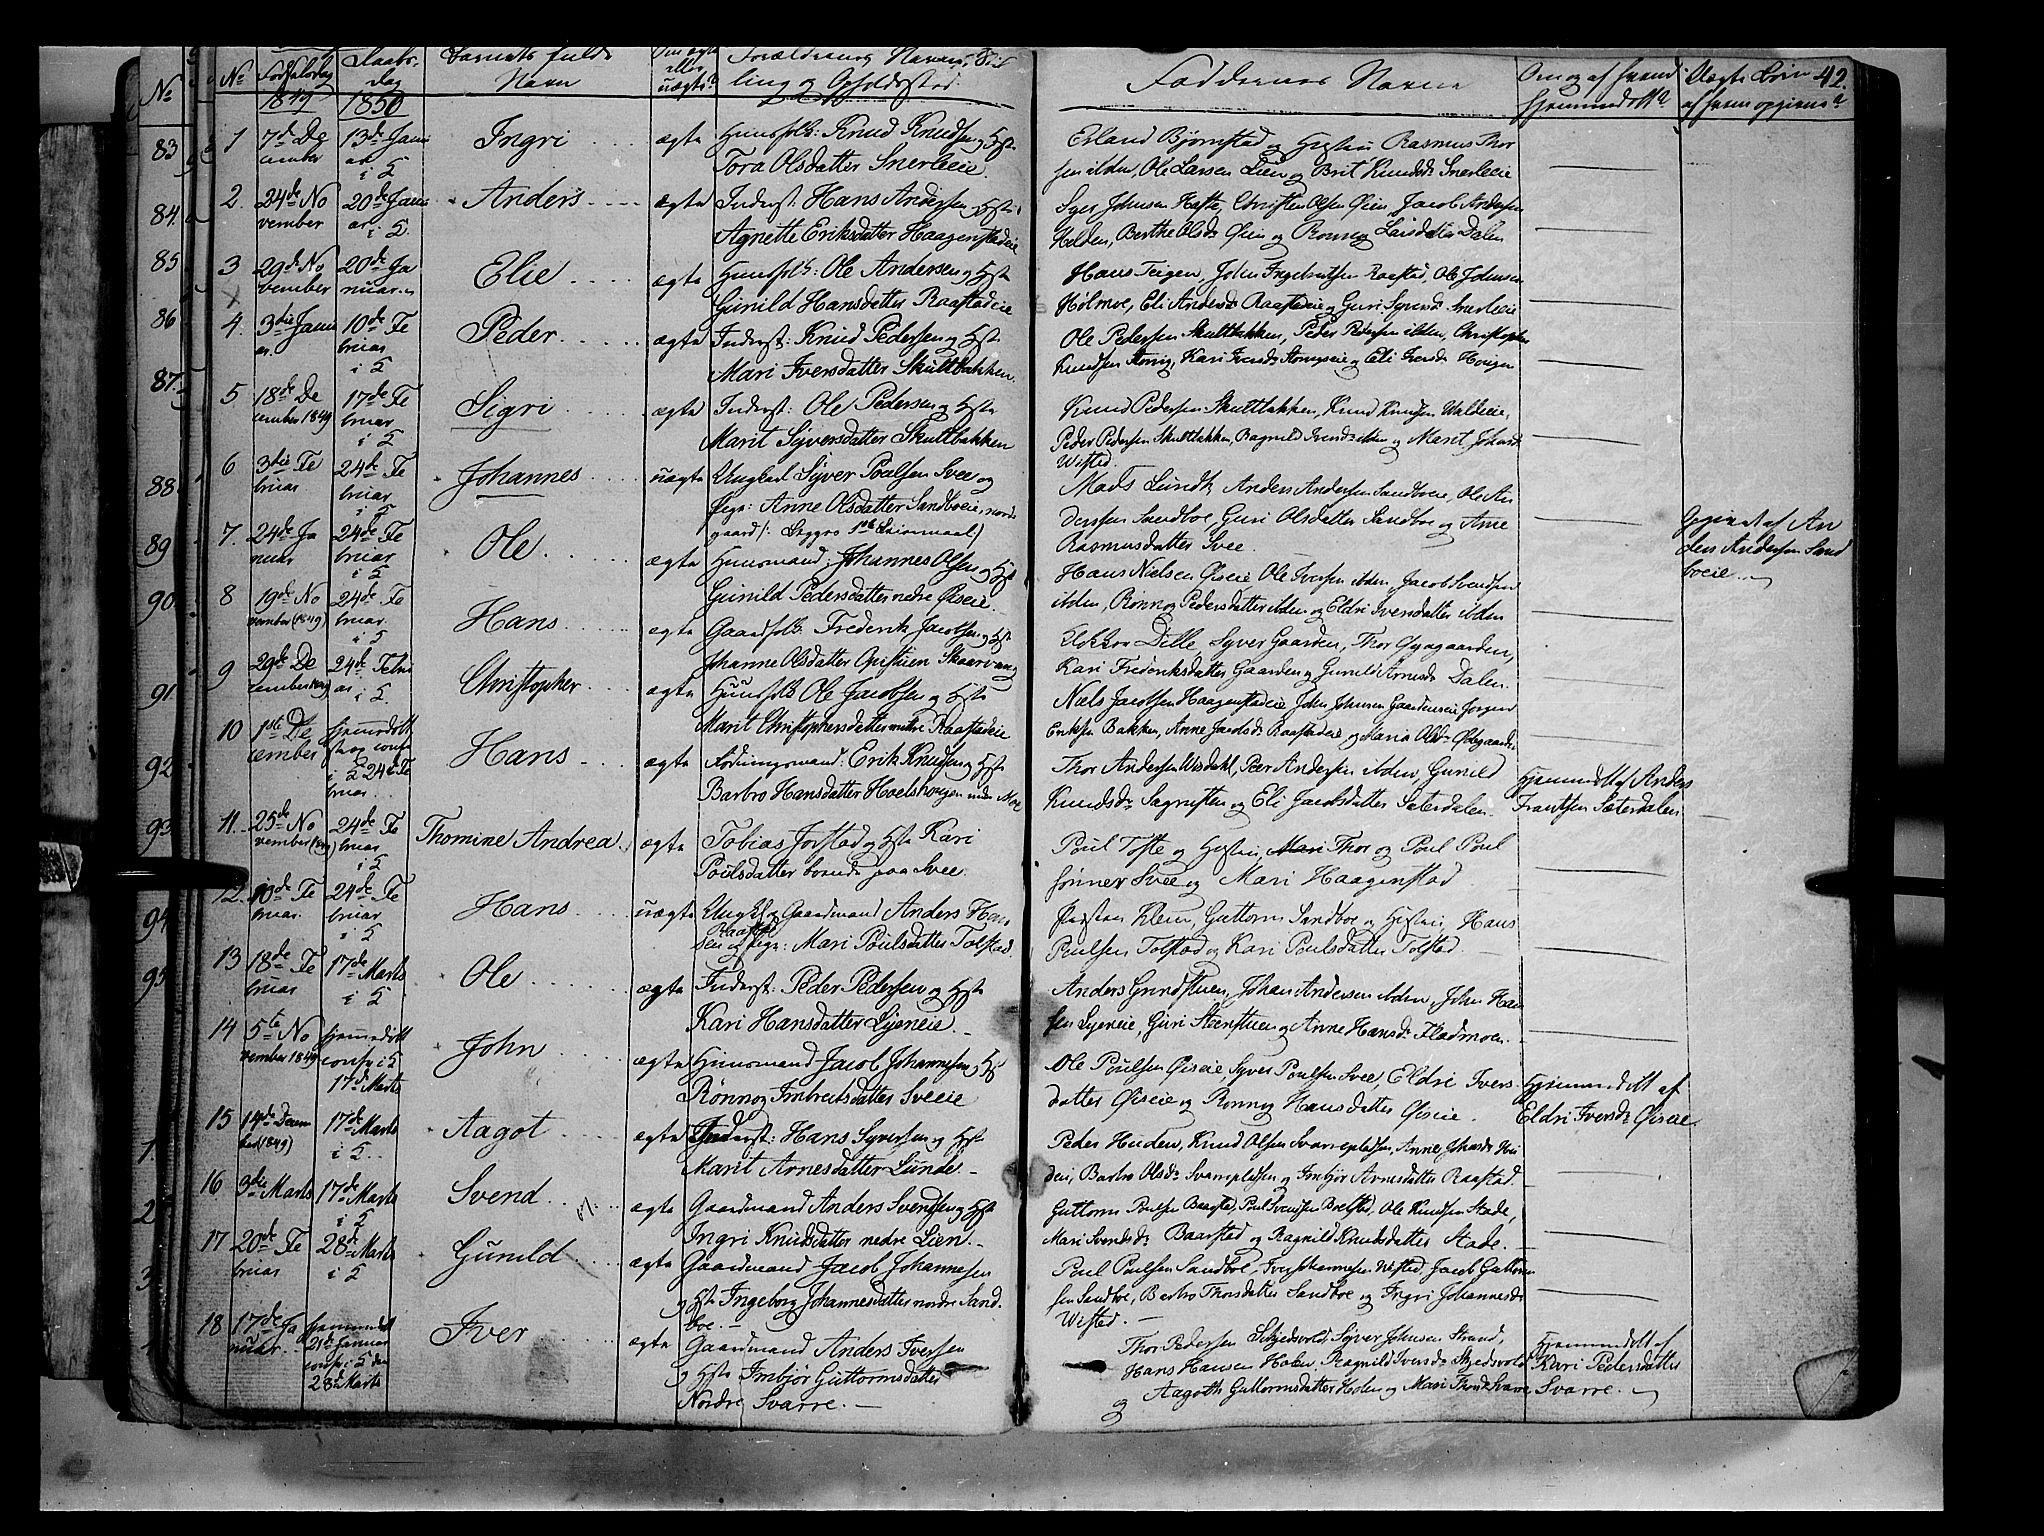 SAH, Vågå prestekontor, Ministerialbok nr. 5 /1, 1842-1856, s. 42